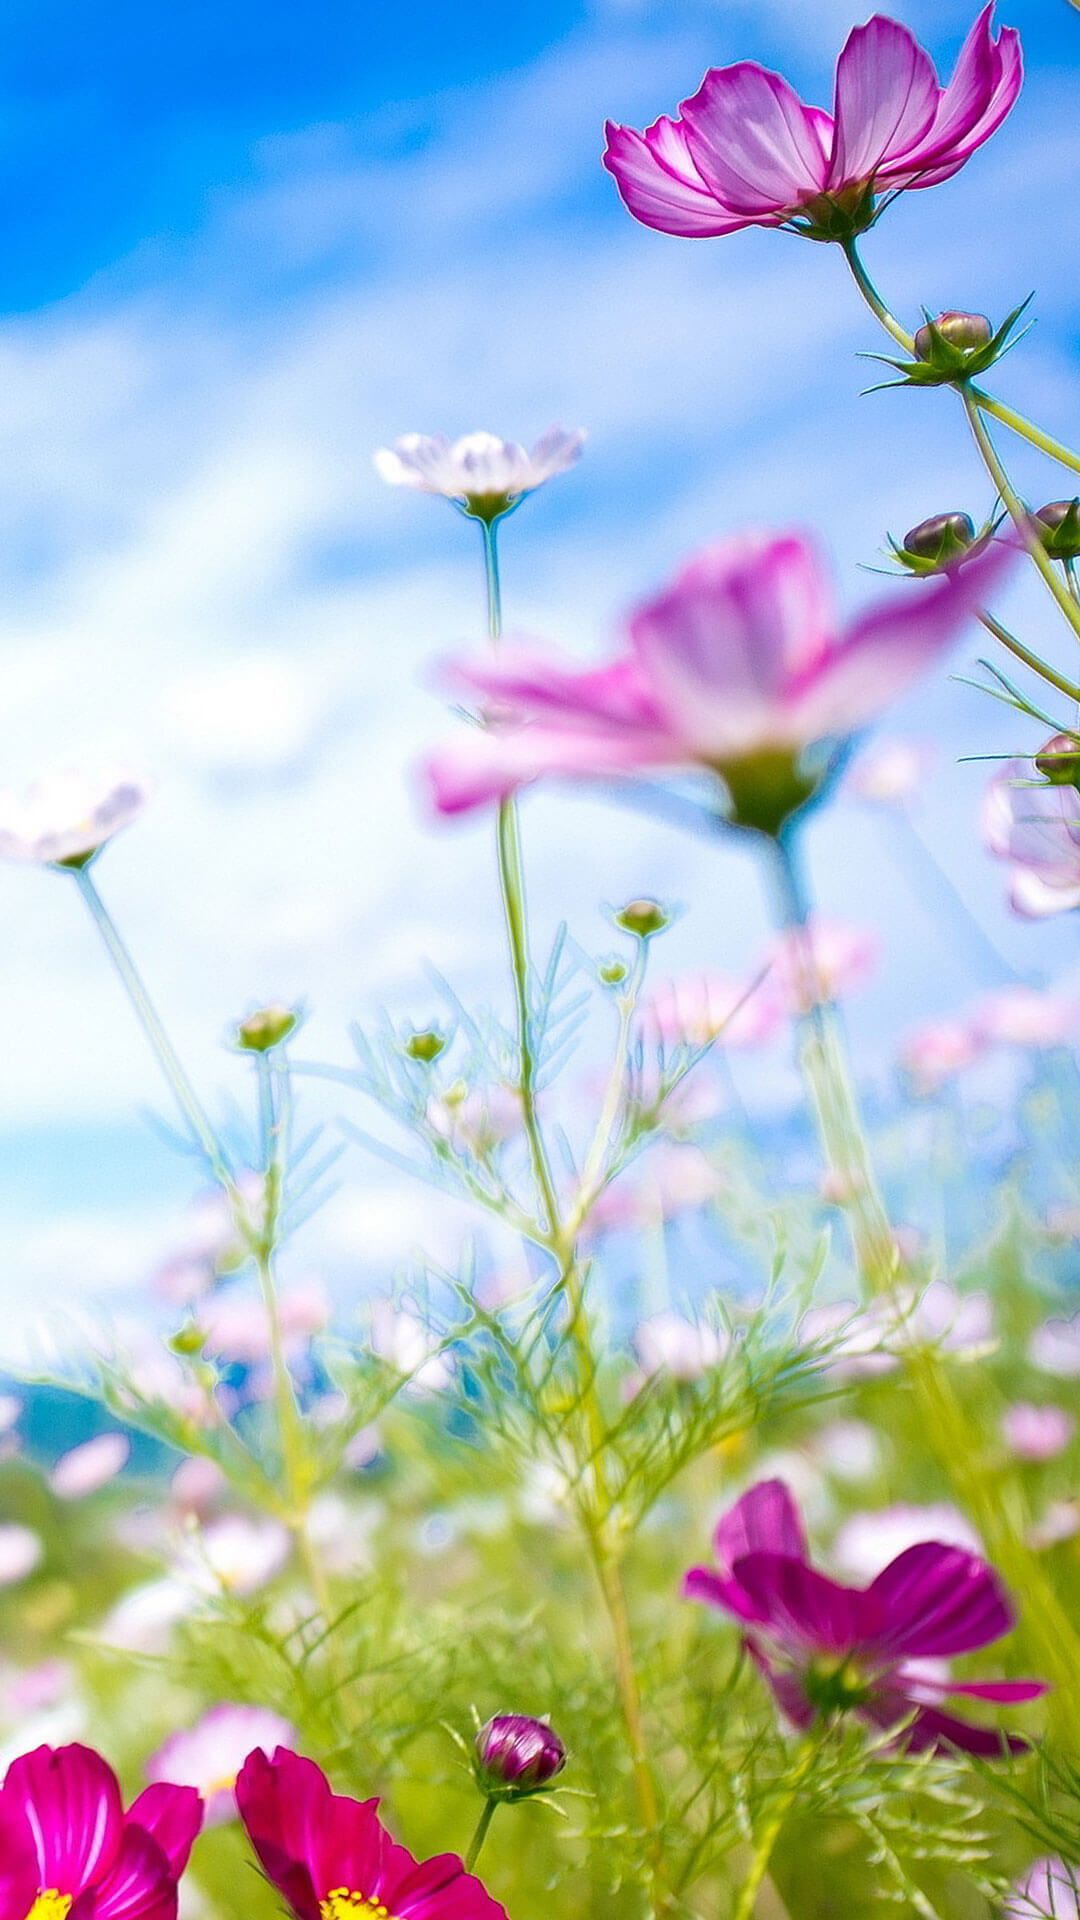 Iphone wallpaper tumblr flower - Spring Flowers Iphone 6 Wallpaper Tumblr Hd